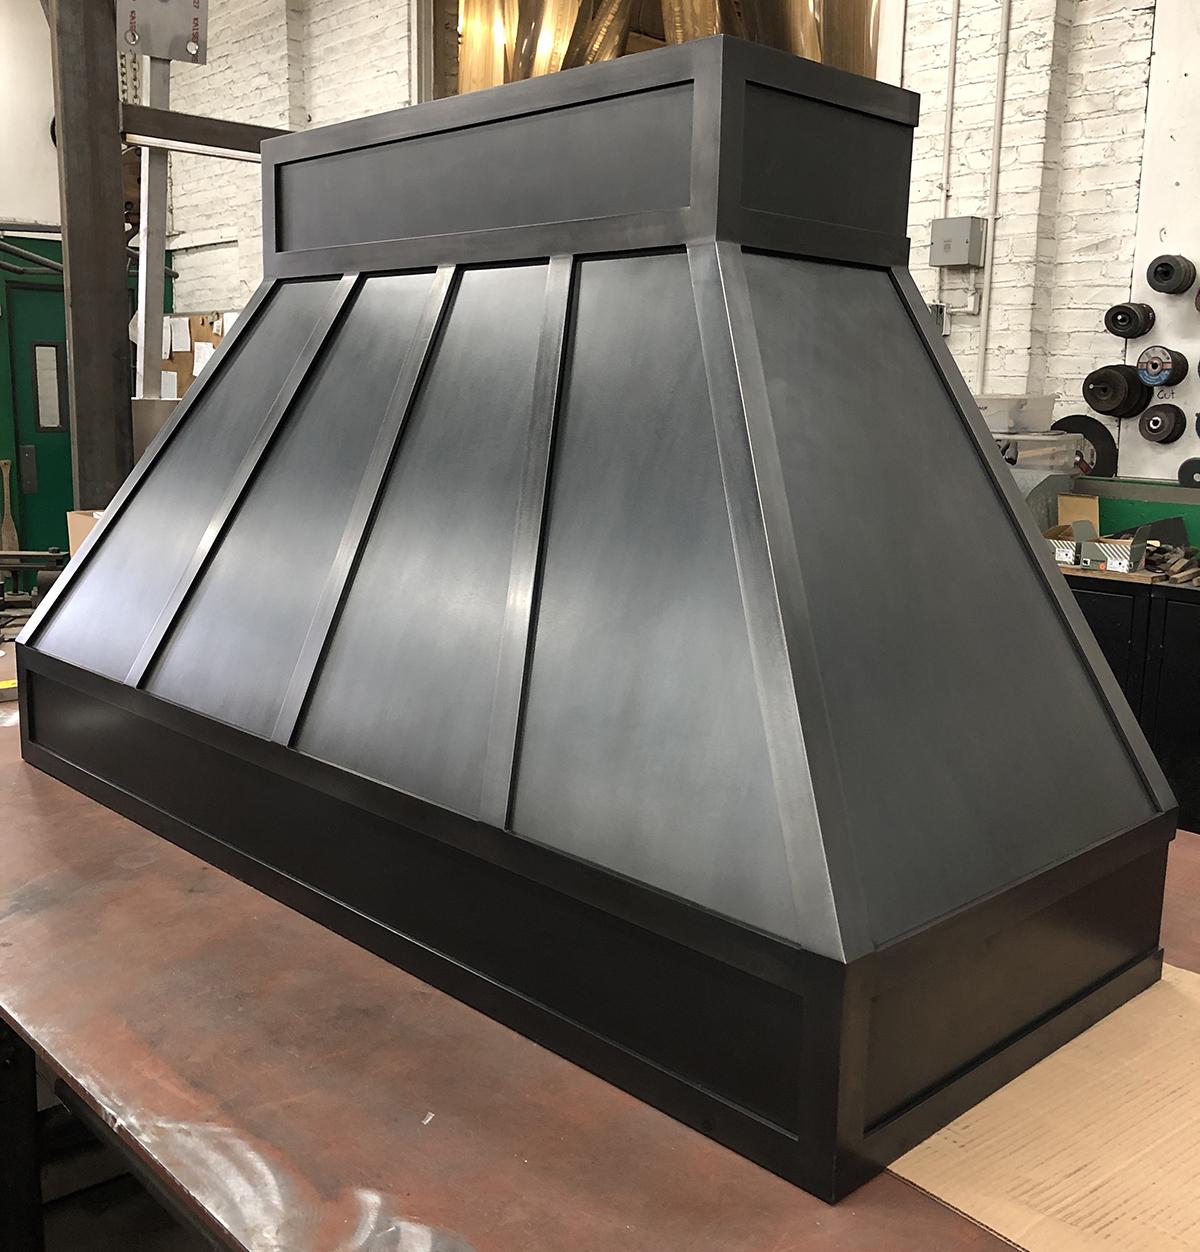 custom metal kitchen hood metalwork blackened steel bauer metal fabrication fabricator architectural metal interior design minnesota twin cities minneapolis st paul mn 4.JPG